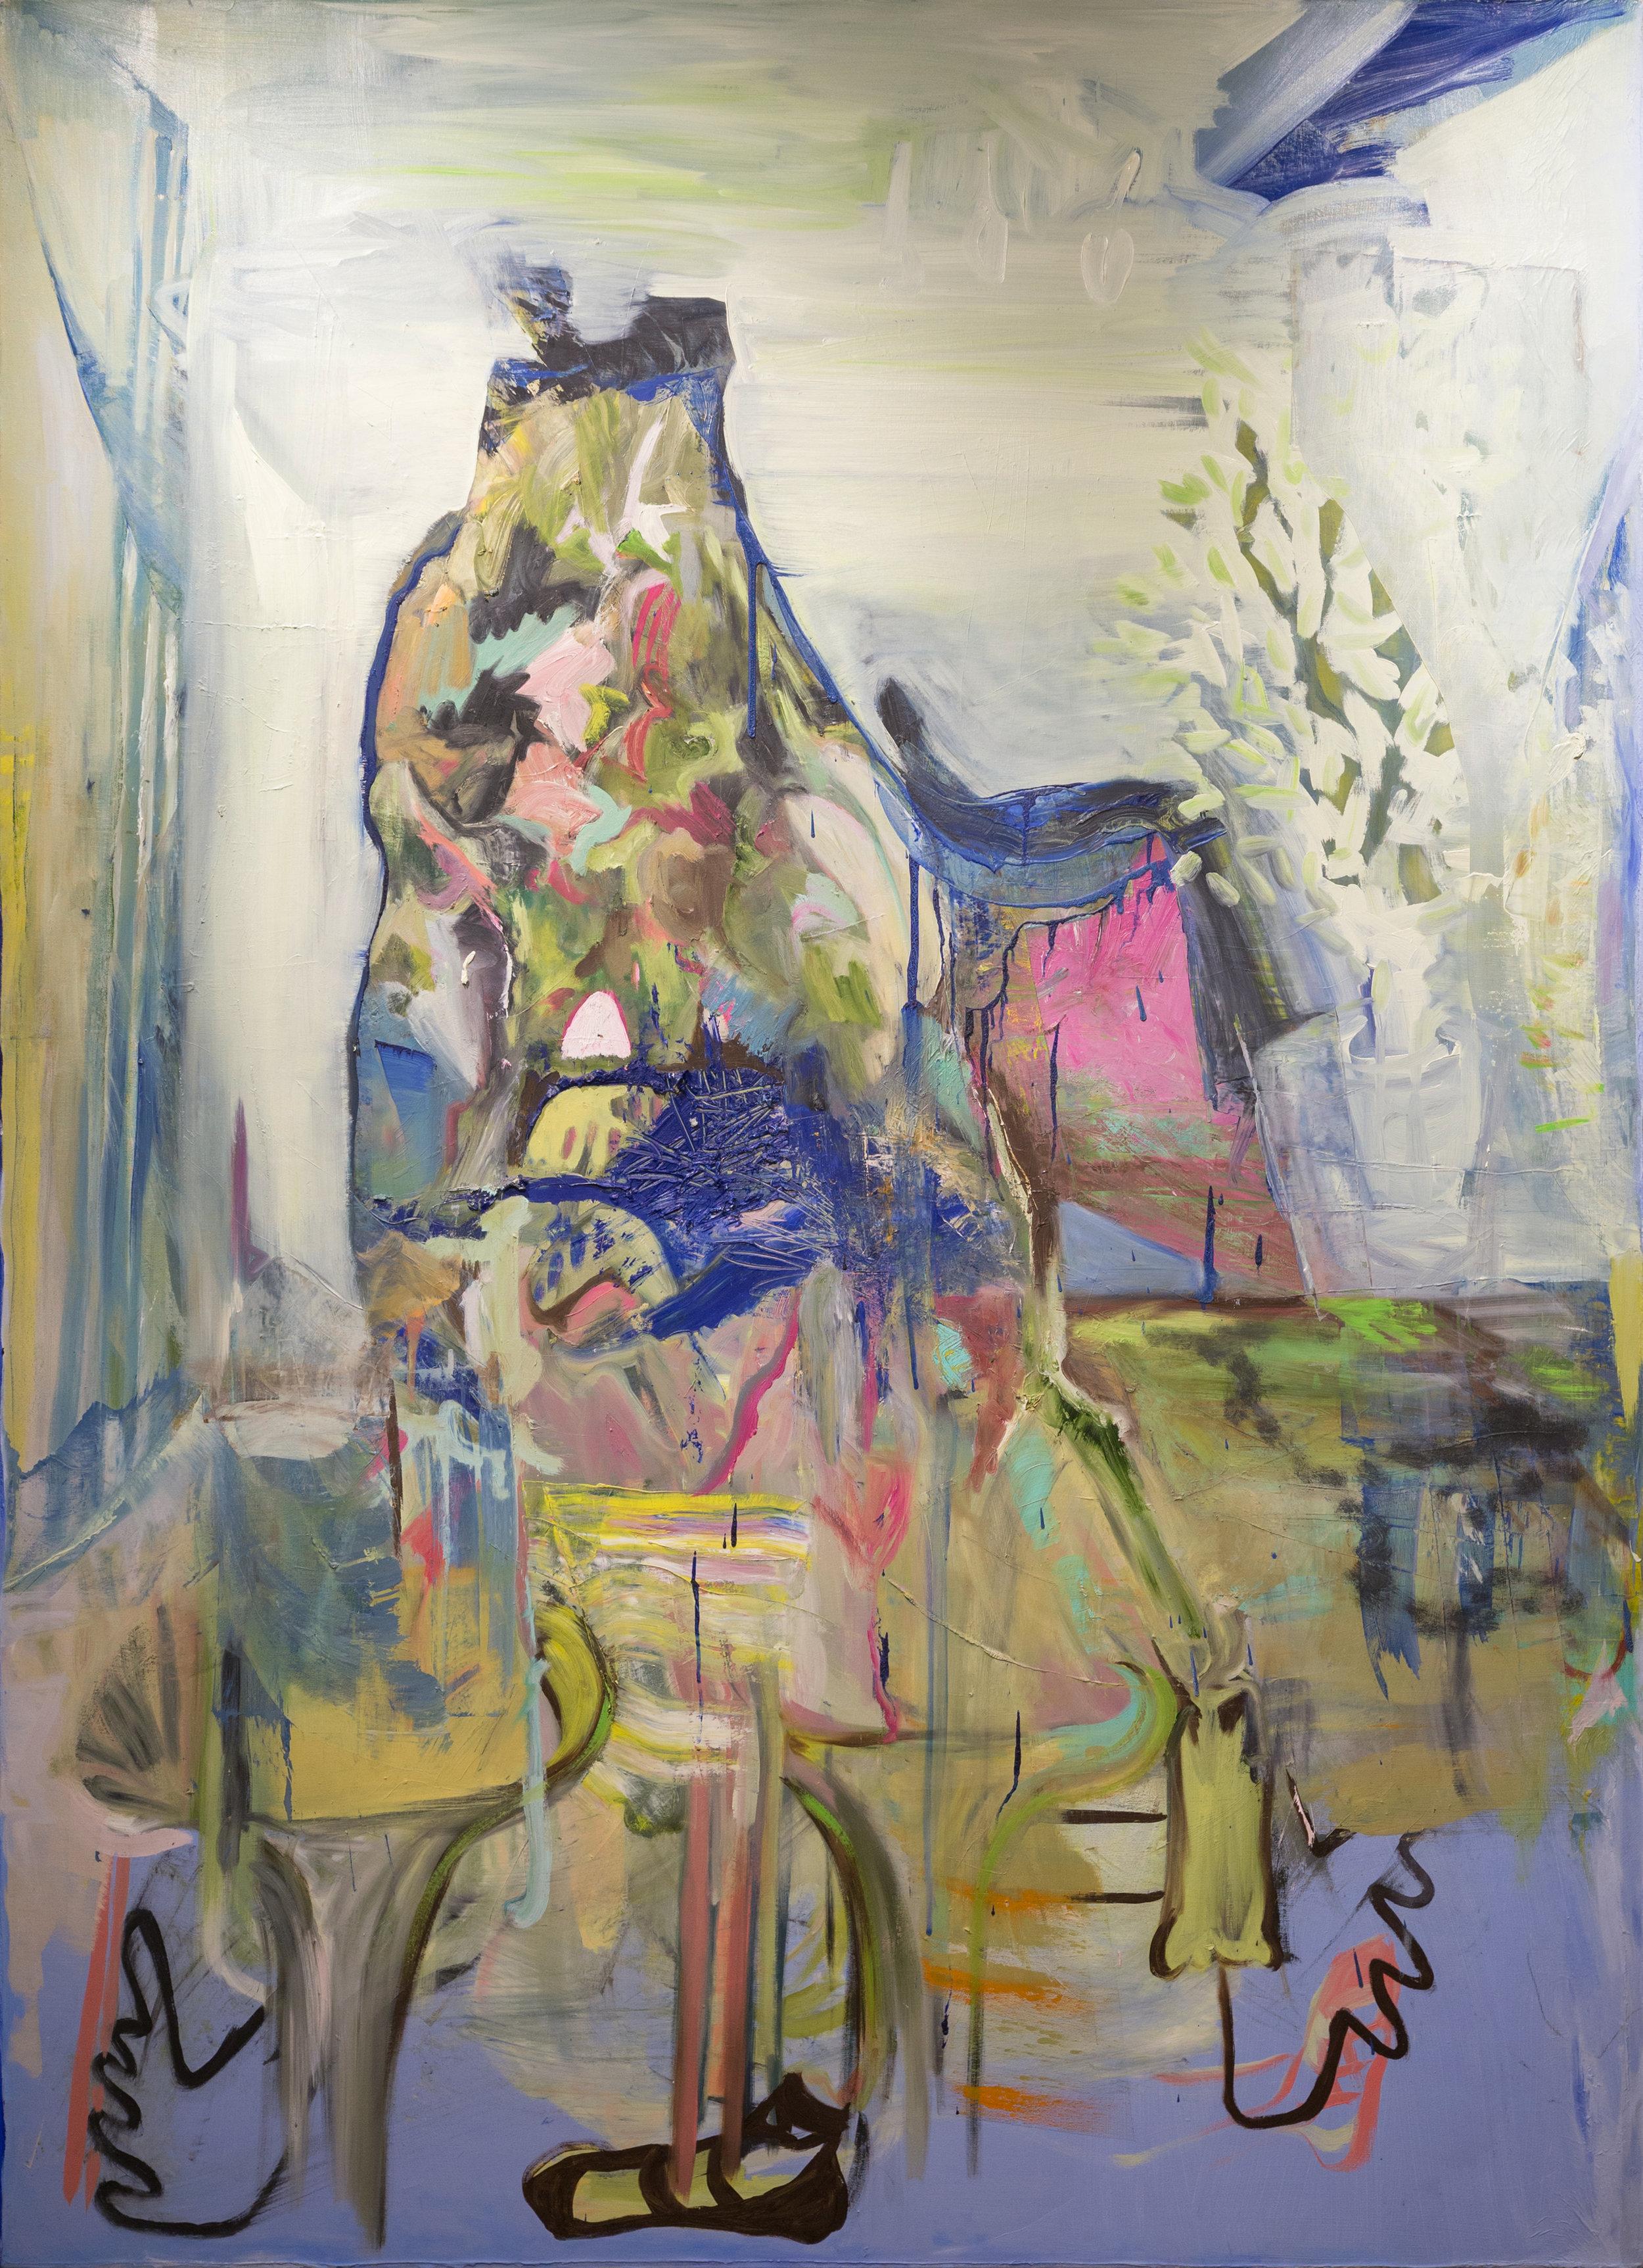 Natasha Doyon,  Living Room , 2013, oil on canvas, 198 x 137 cm